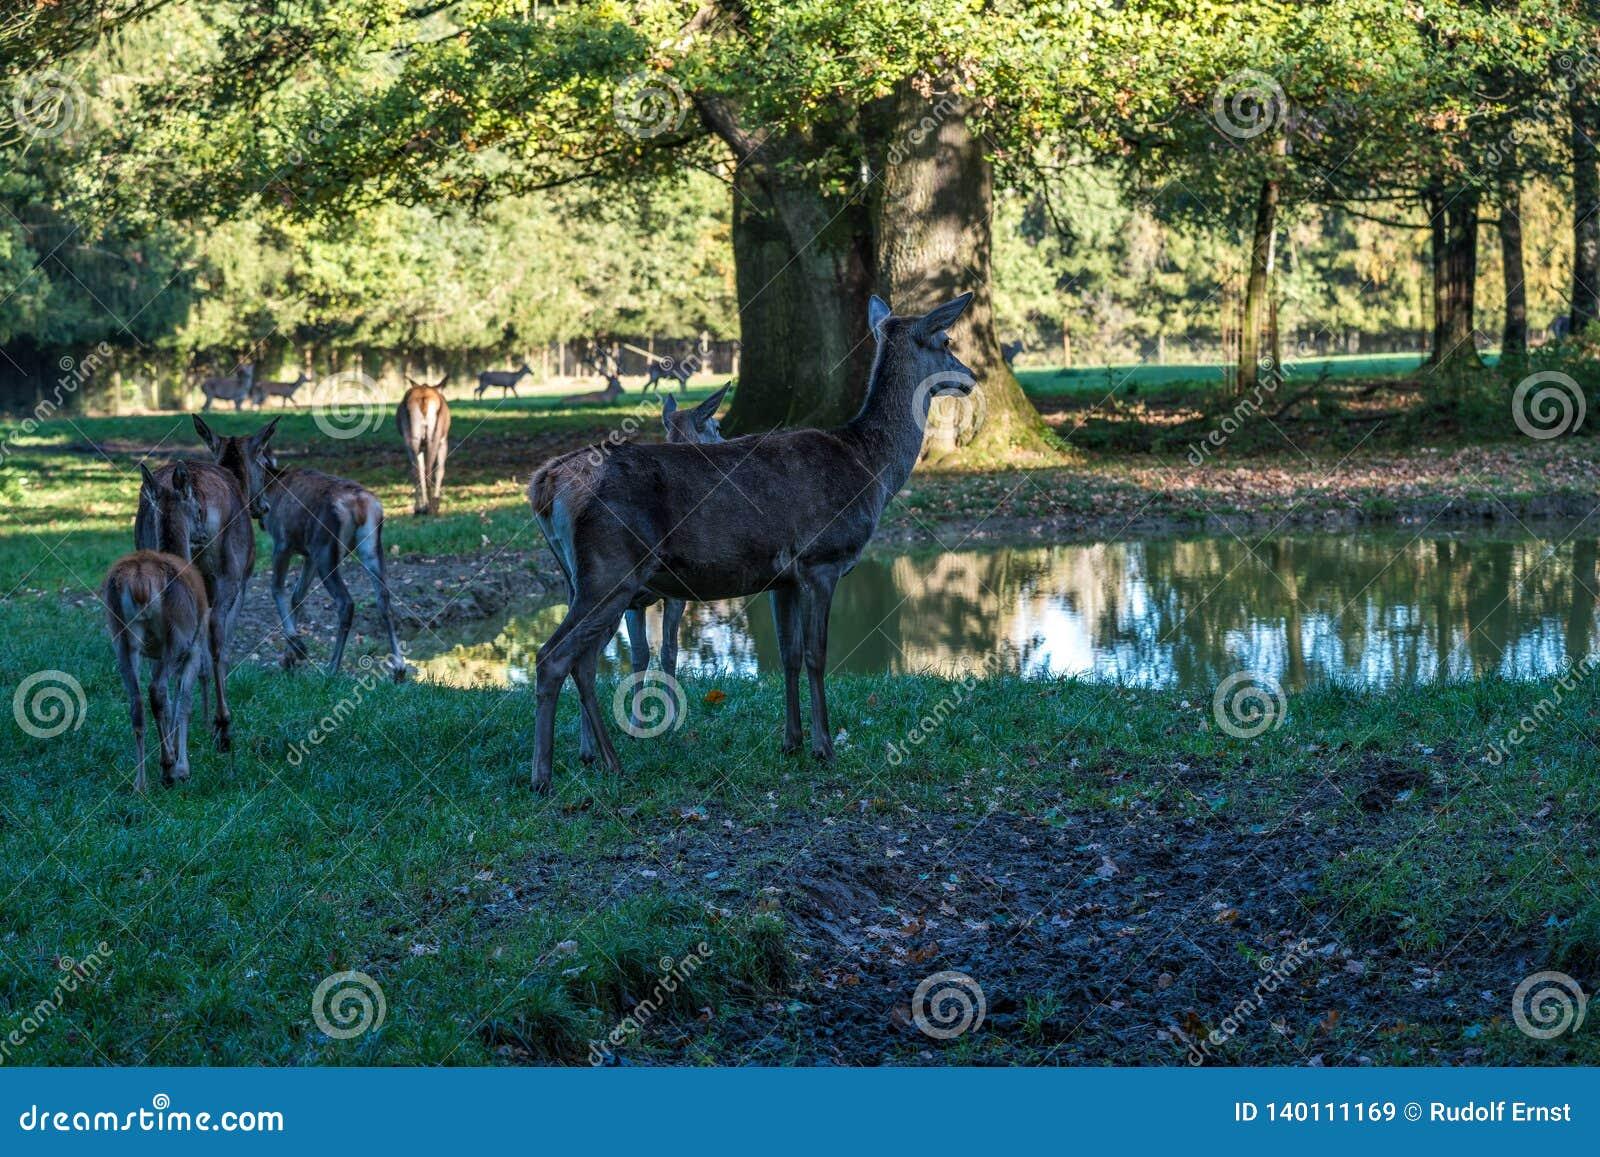 Red deer, Cervus elaphus in a german nature park